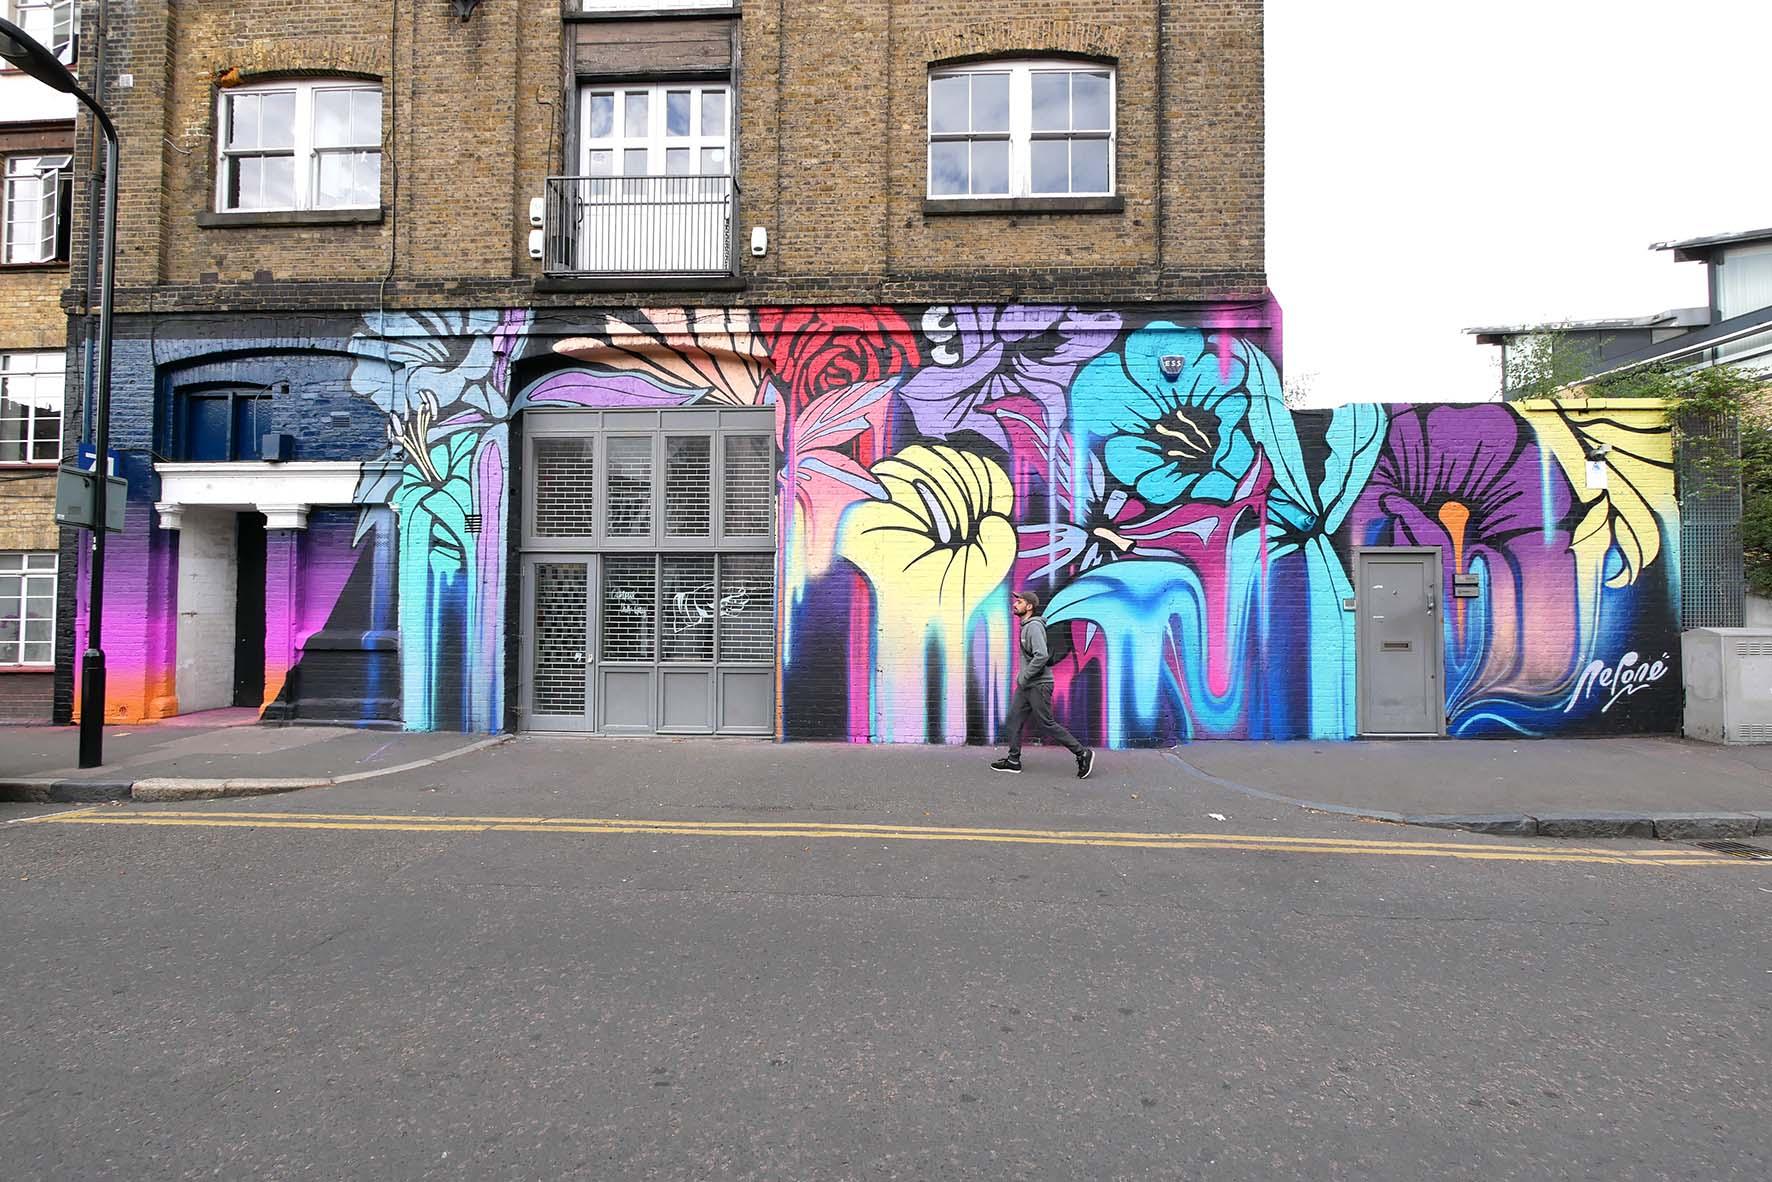 nerone-global-street-art-london-flowers